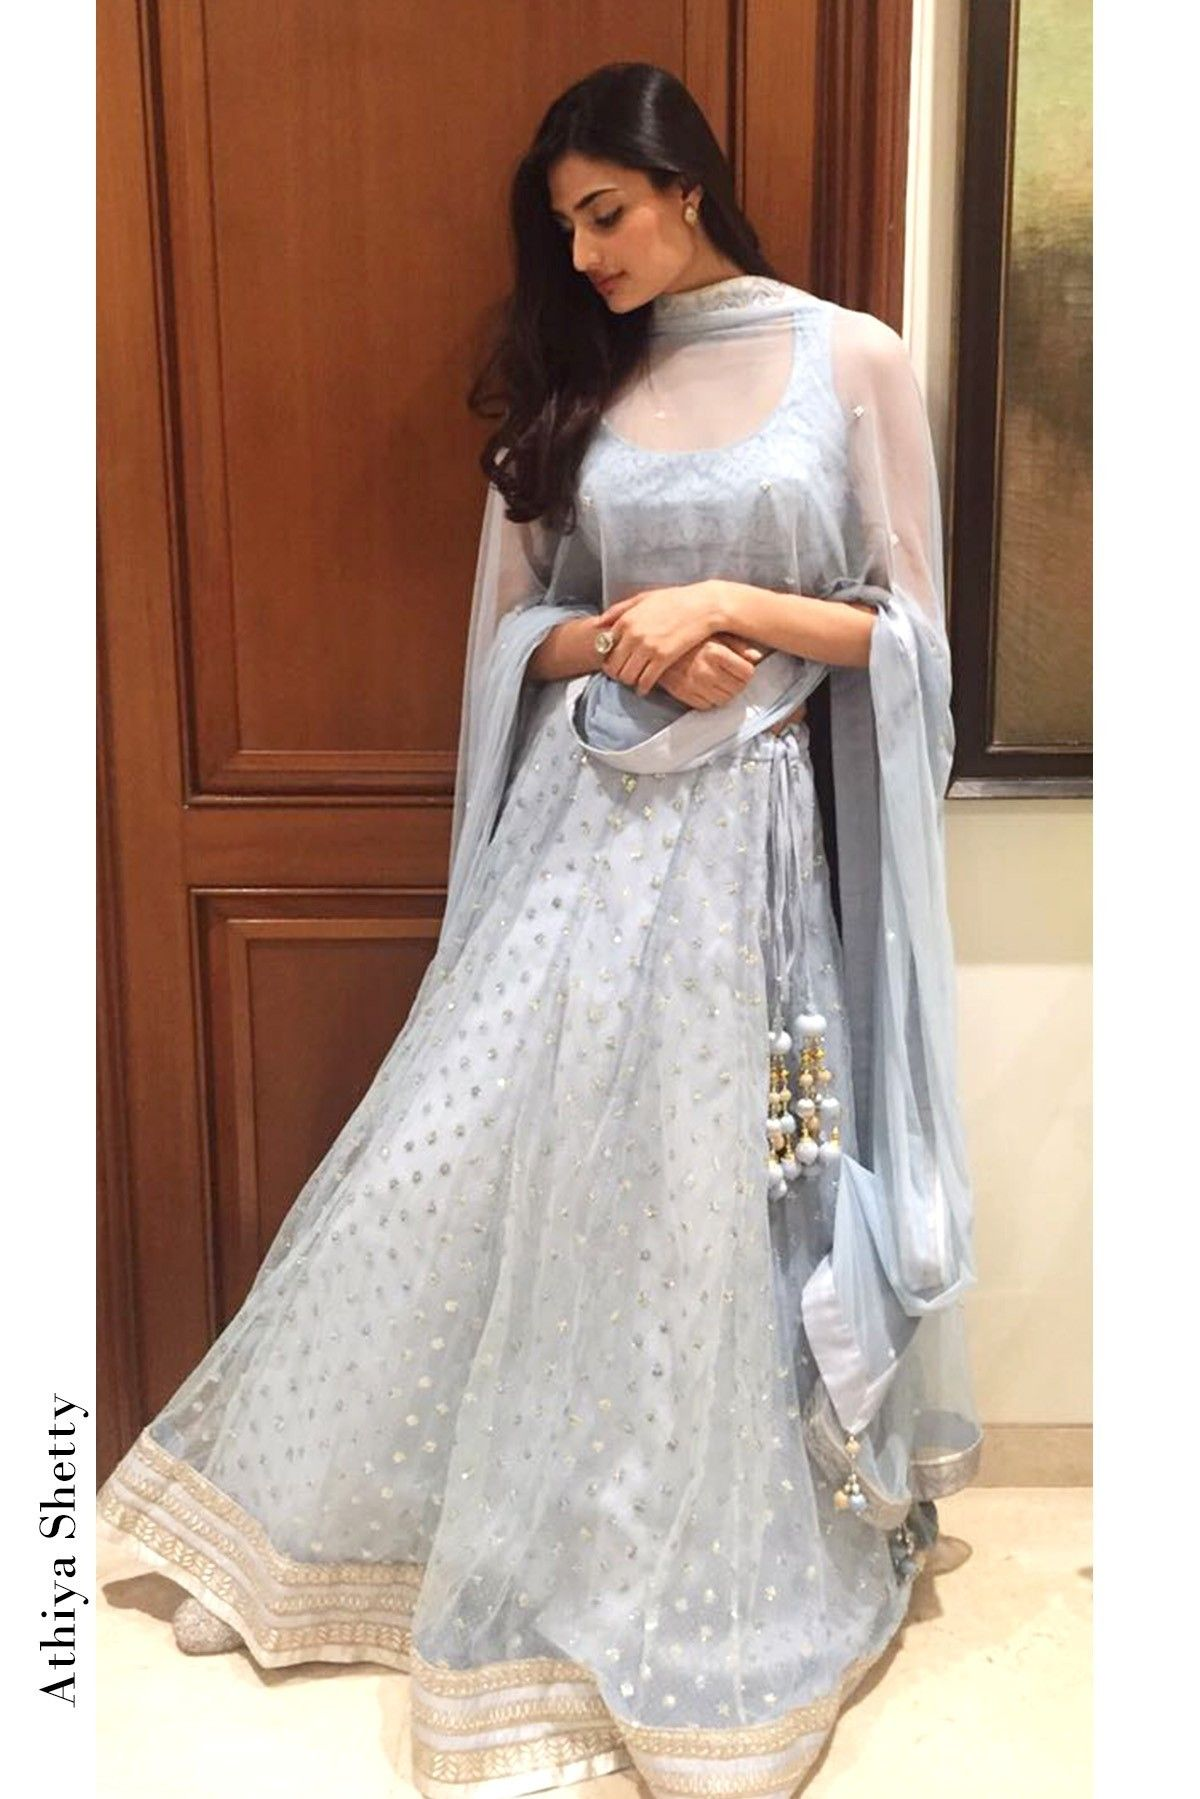 d9a19ffe38 Ice Blue Net Embroidered Lehenga Choli With Dupatta | beautiful ...